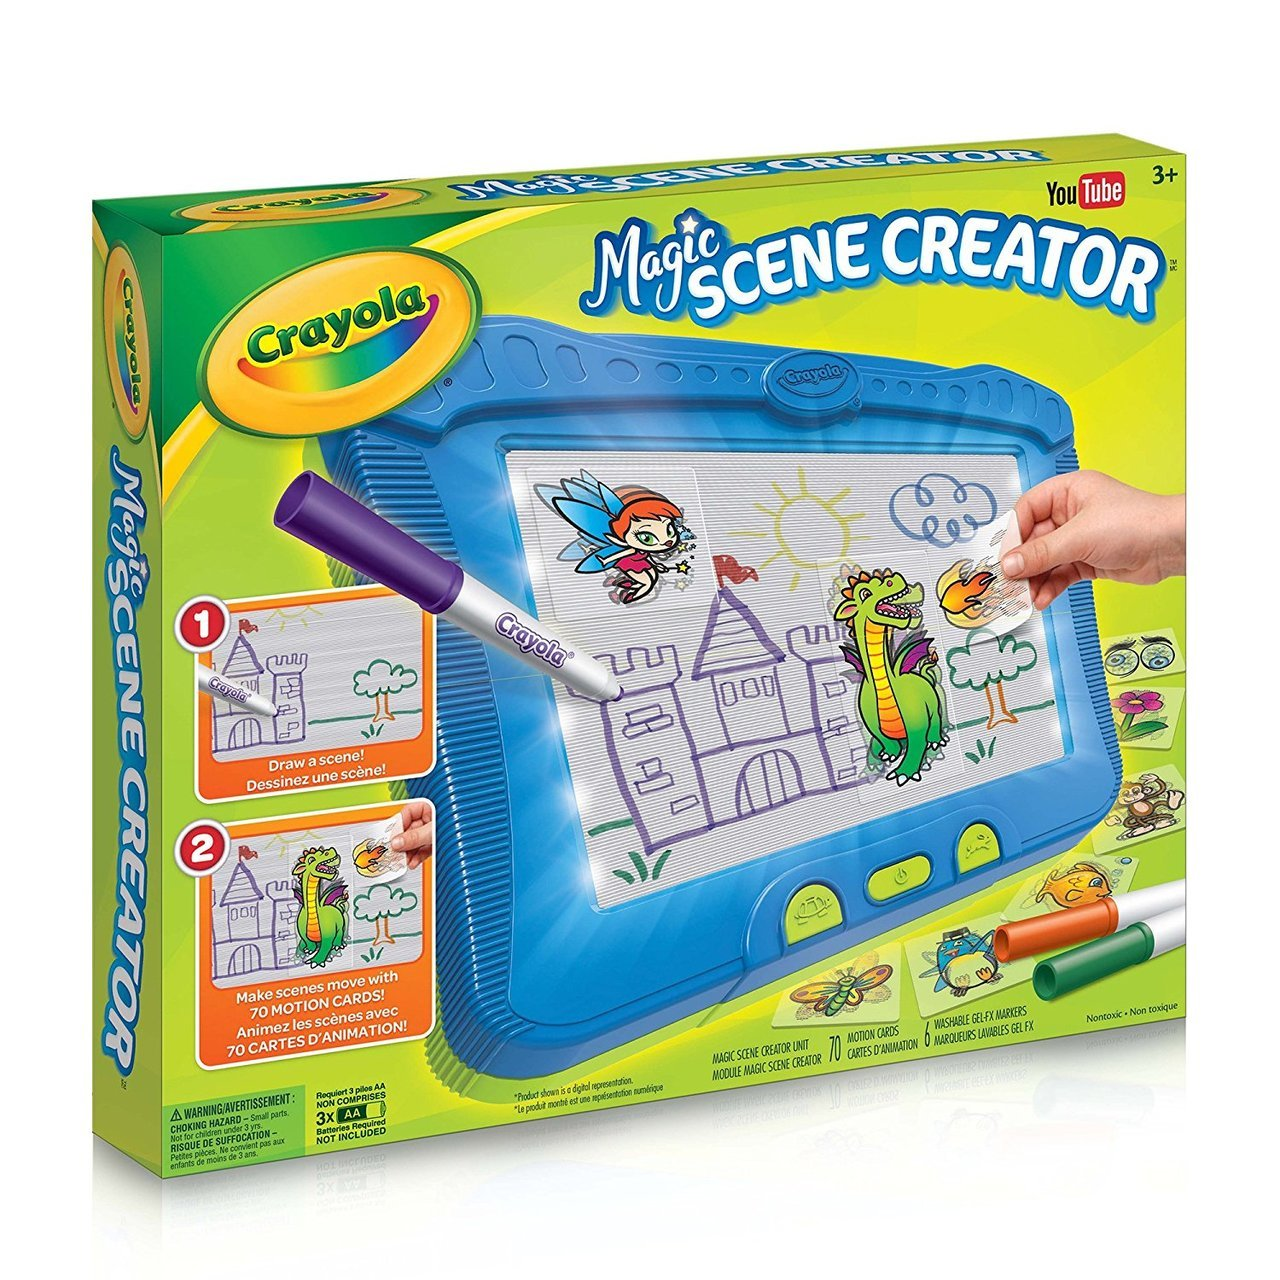 Crayola Magic Scene Creator Drawing Kit for Kids by Crayola